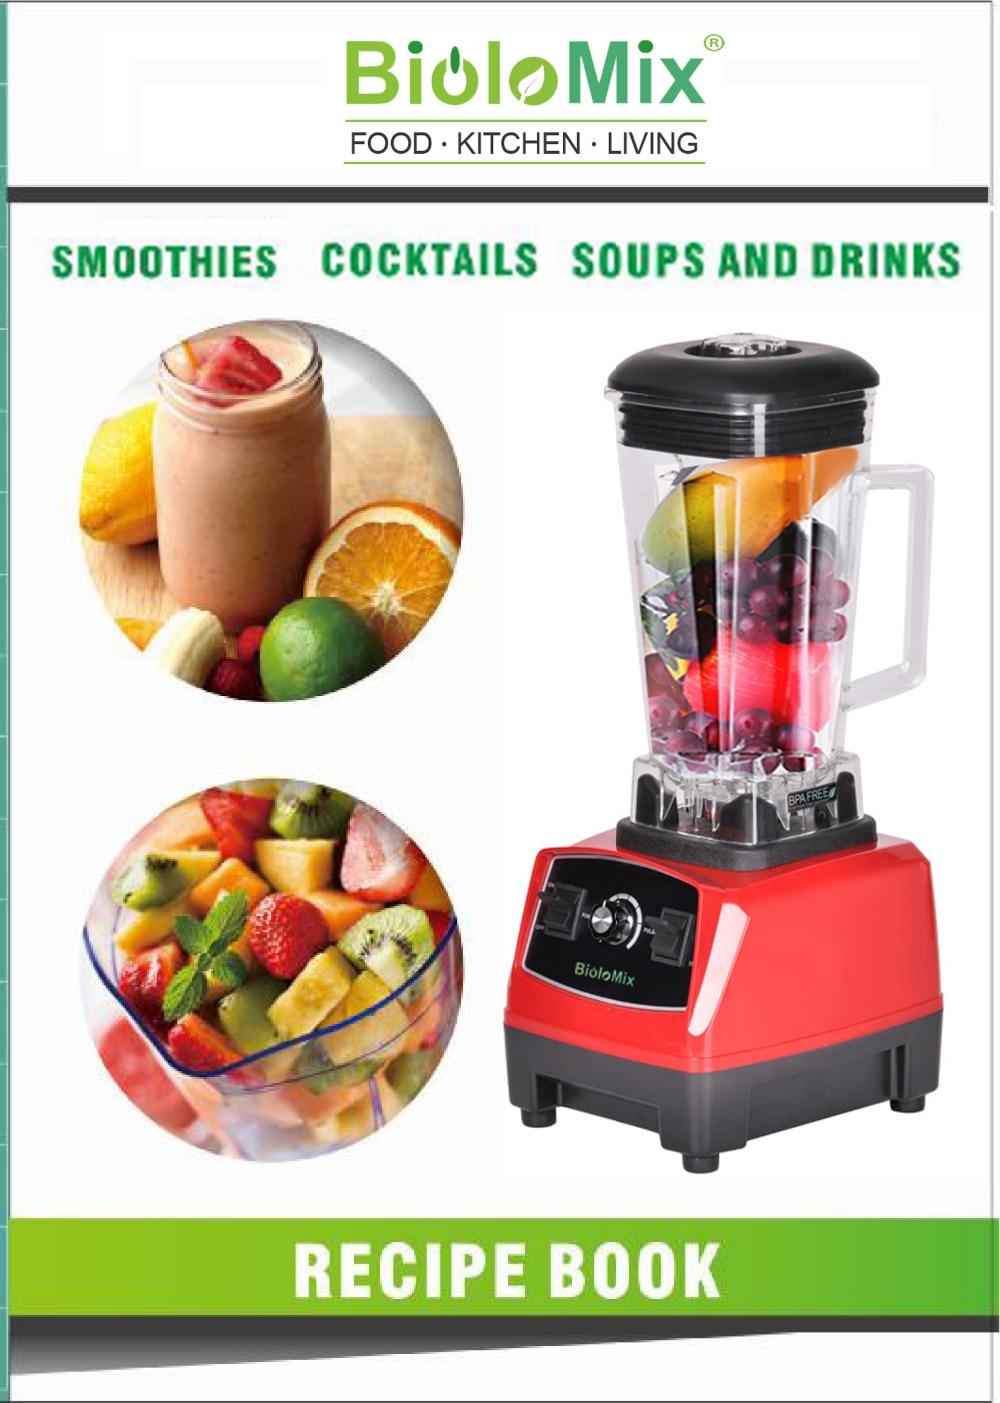 HTB19lfOJ1SSBuNjy0Flq6zBpVXa2 BPA Free Commercial Grade Timer Blender Mixer Heavy Duty Automatic Fruit Juicer Food Processor Ice Crusher Smoothies 2200W